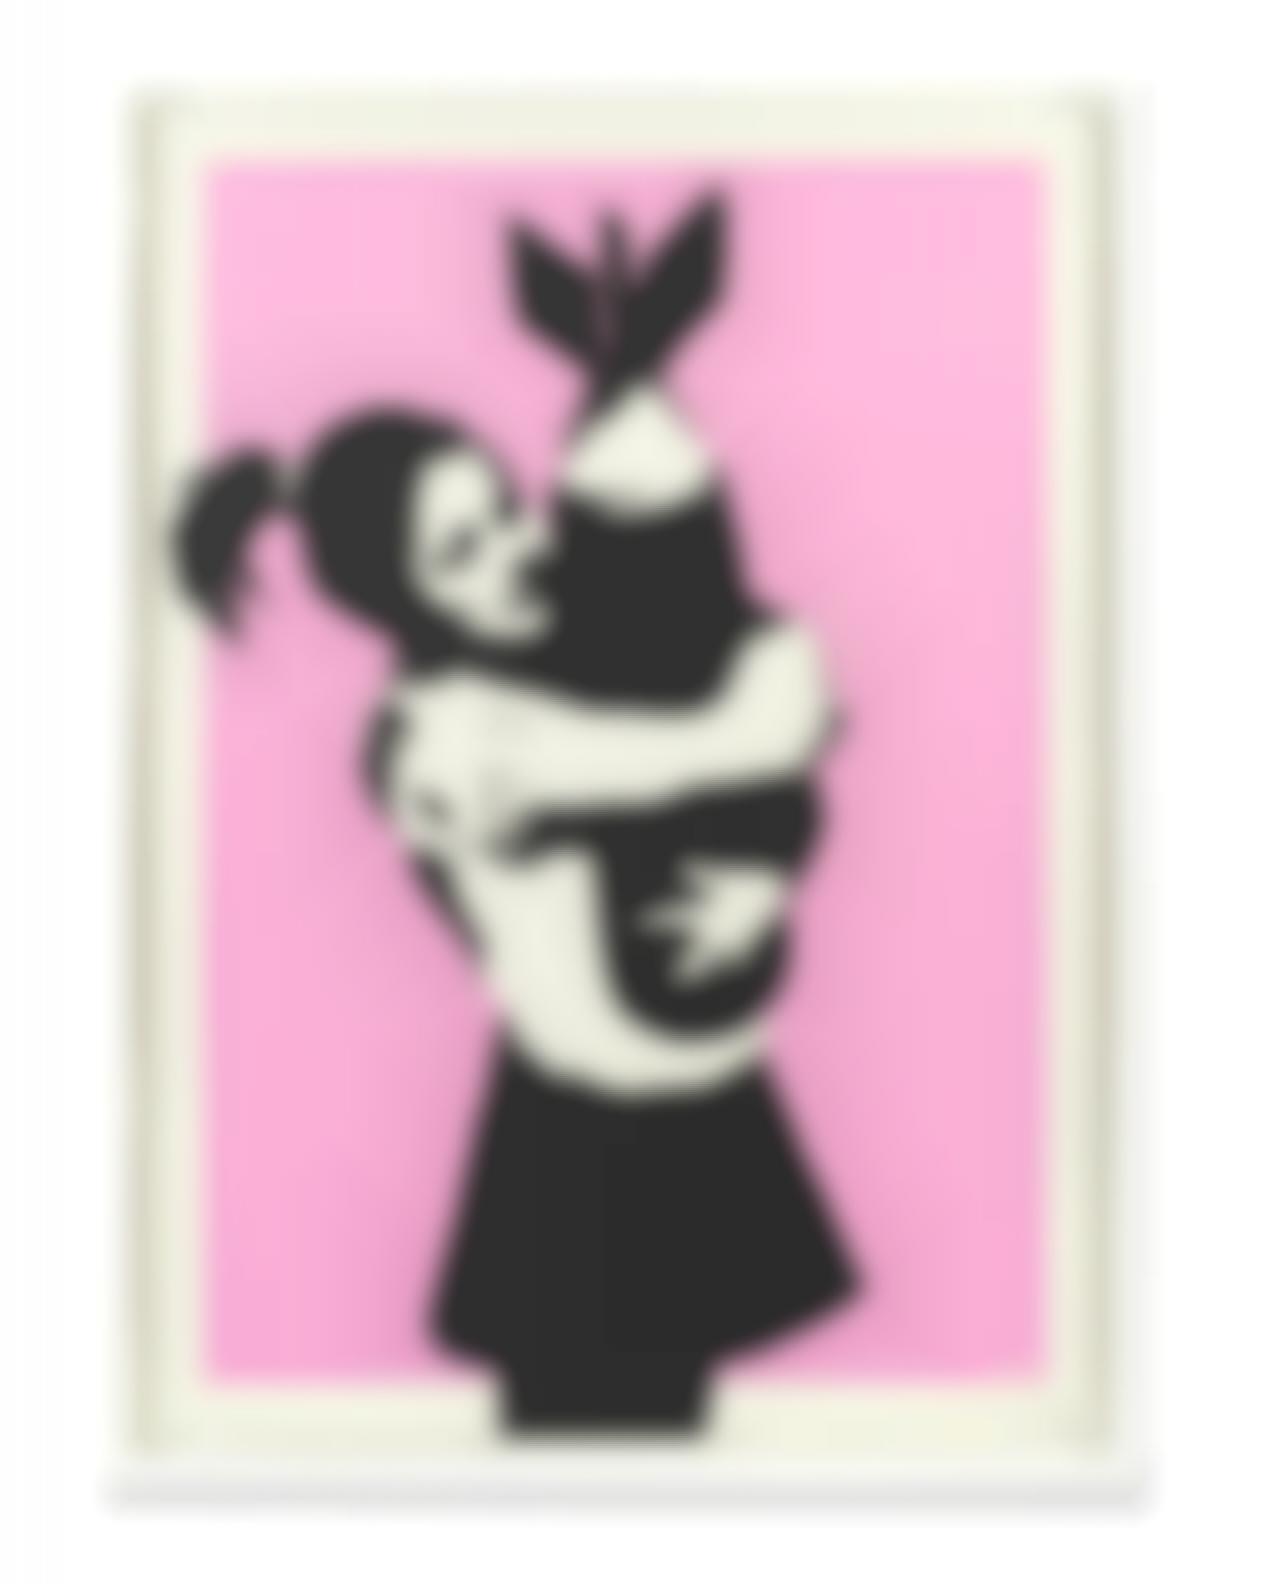 Banksy-Bomb Hugger (Bomb Love)-2004